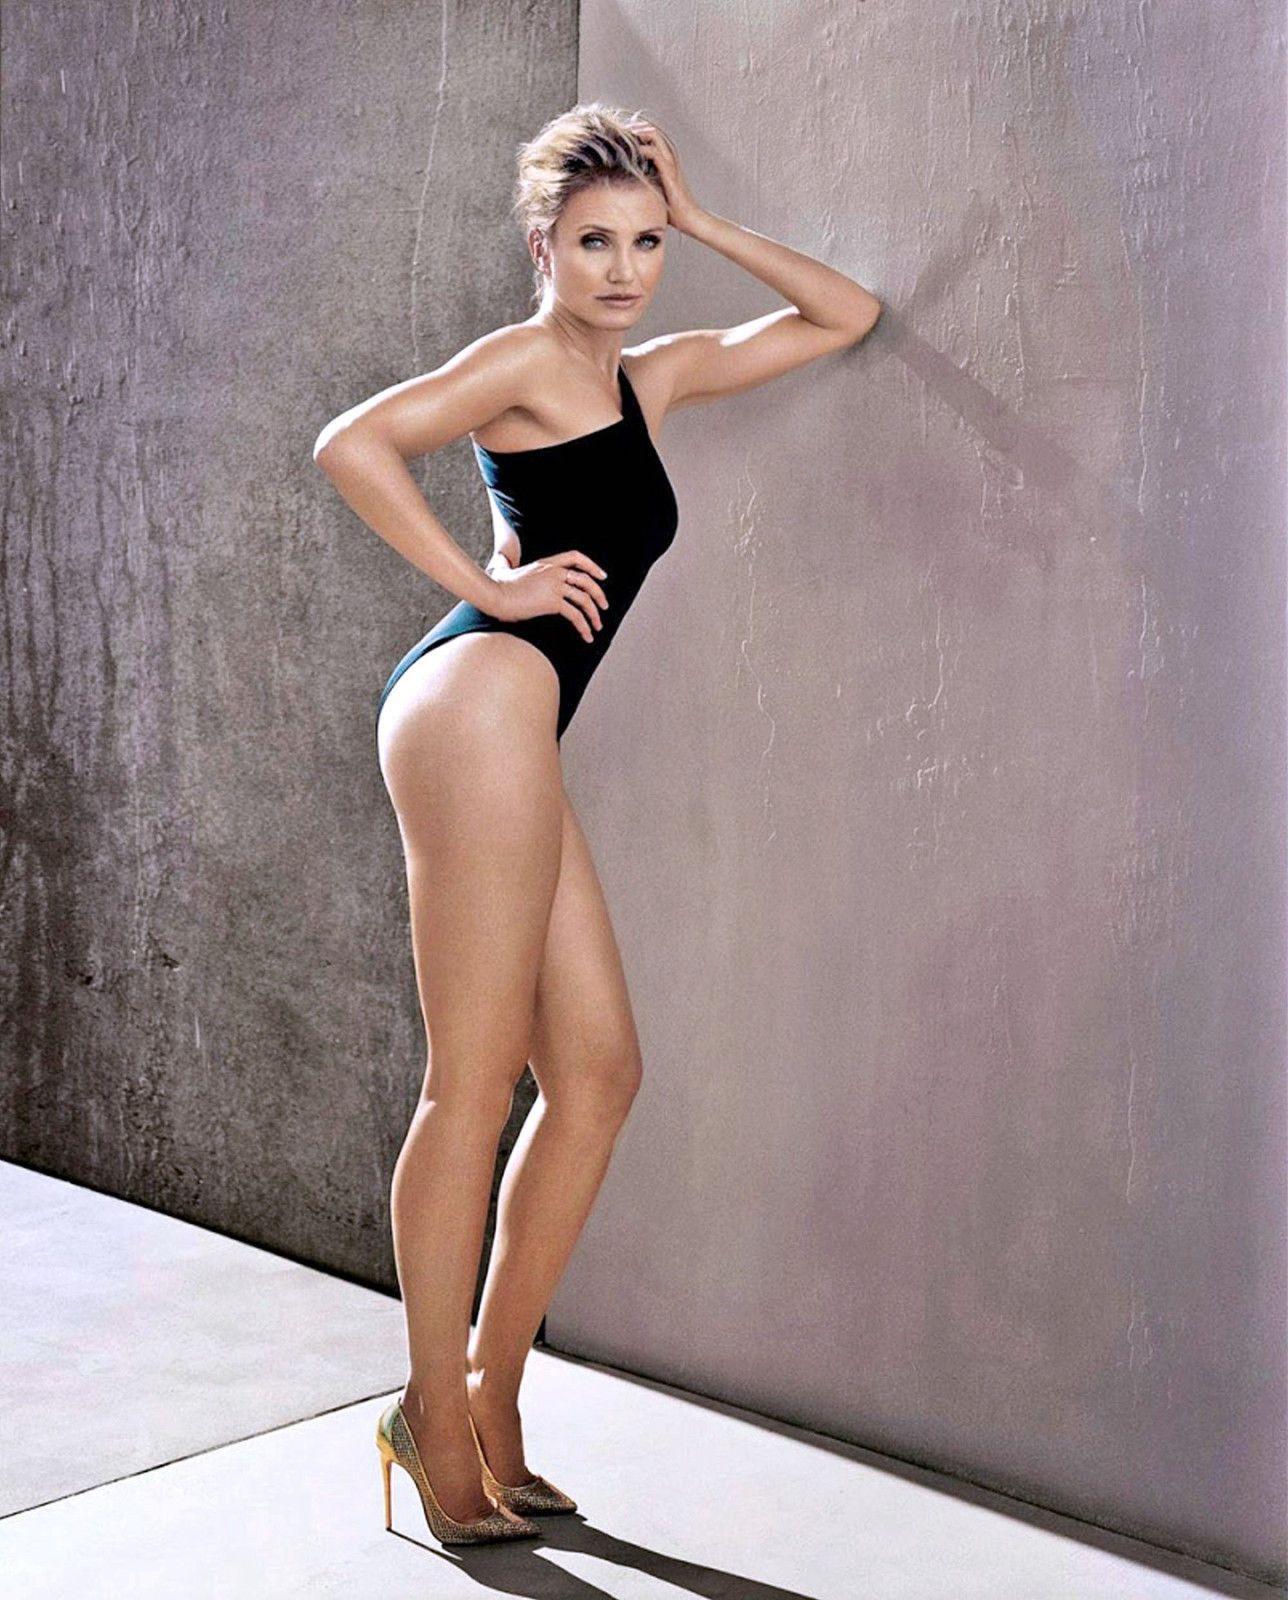 Theme Cameron diaz nude legs accept. opinion